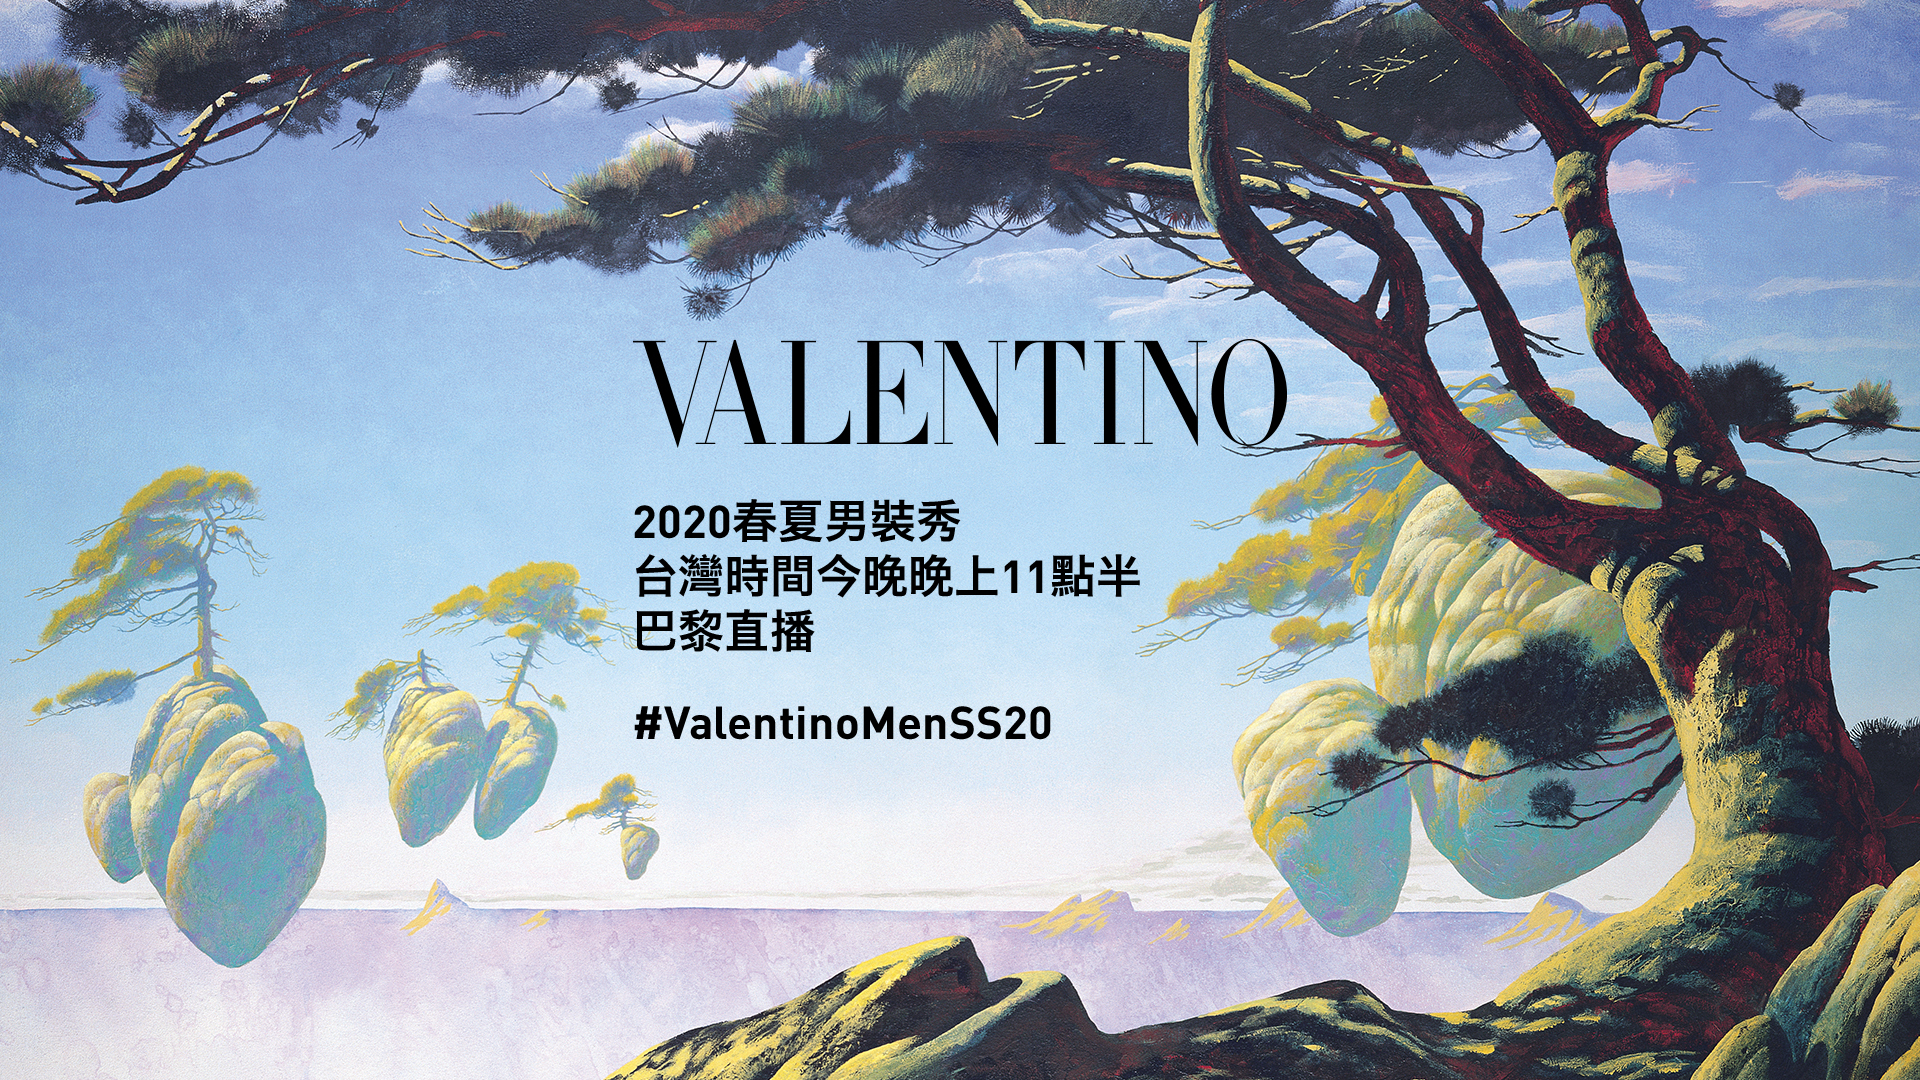 Valentino 2020 春夏男裝大秀